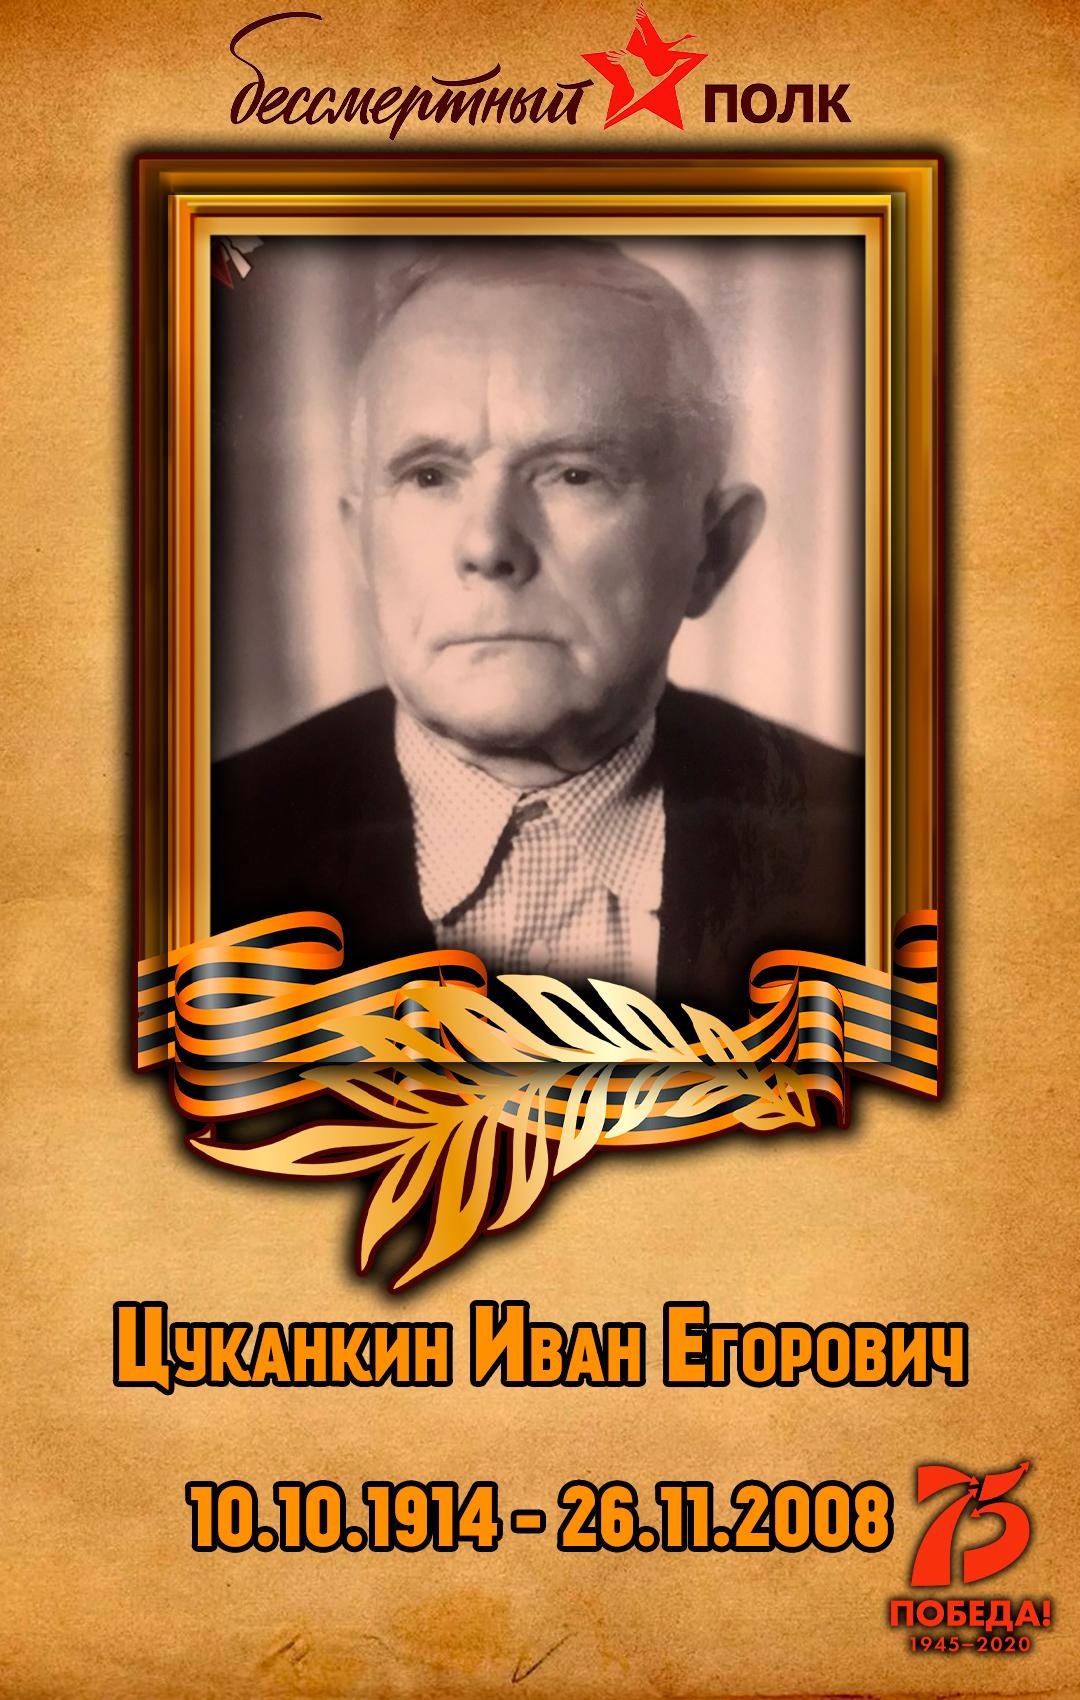 Цуканкин-Иван-Егорович